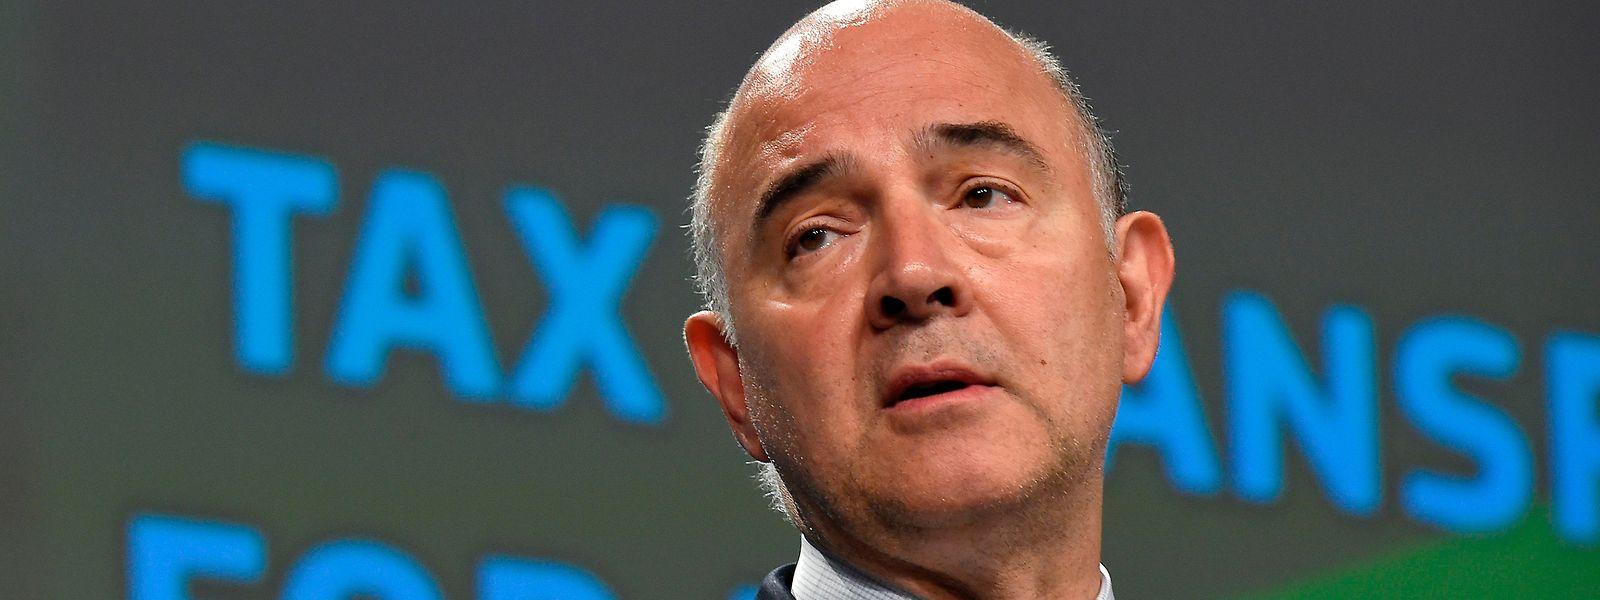 EU-Finanzkommissar Pierre Moscovici.